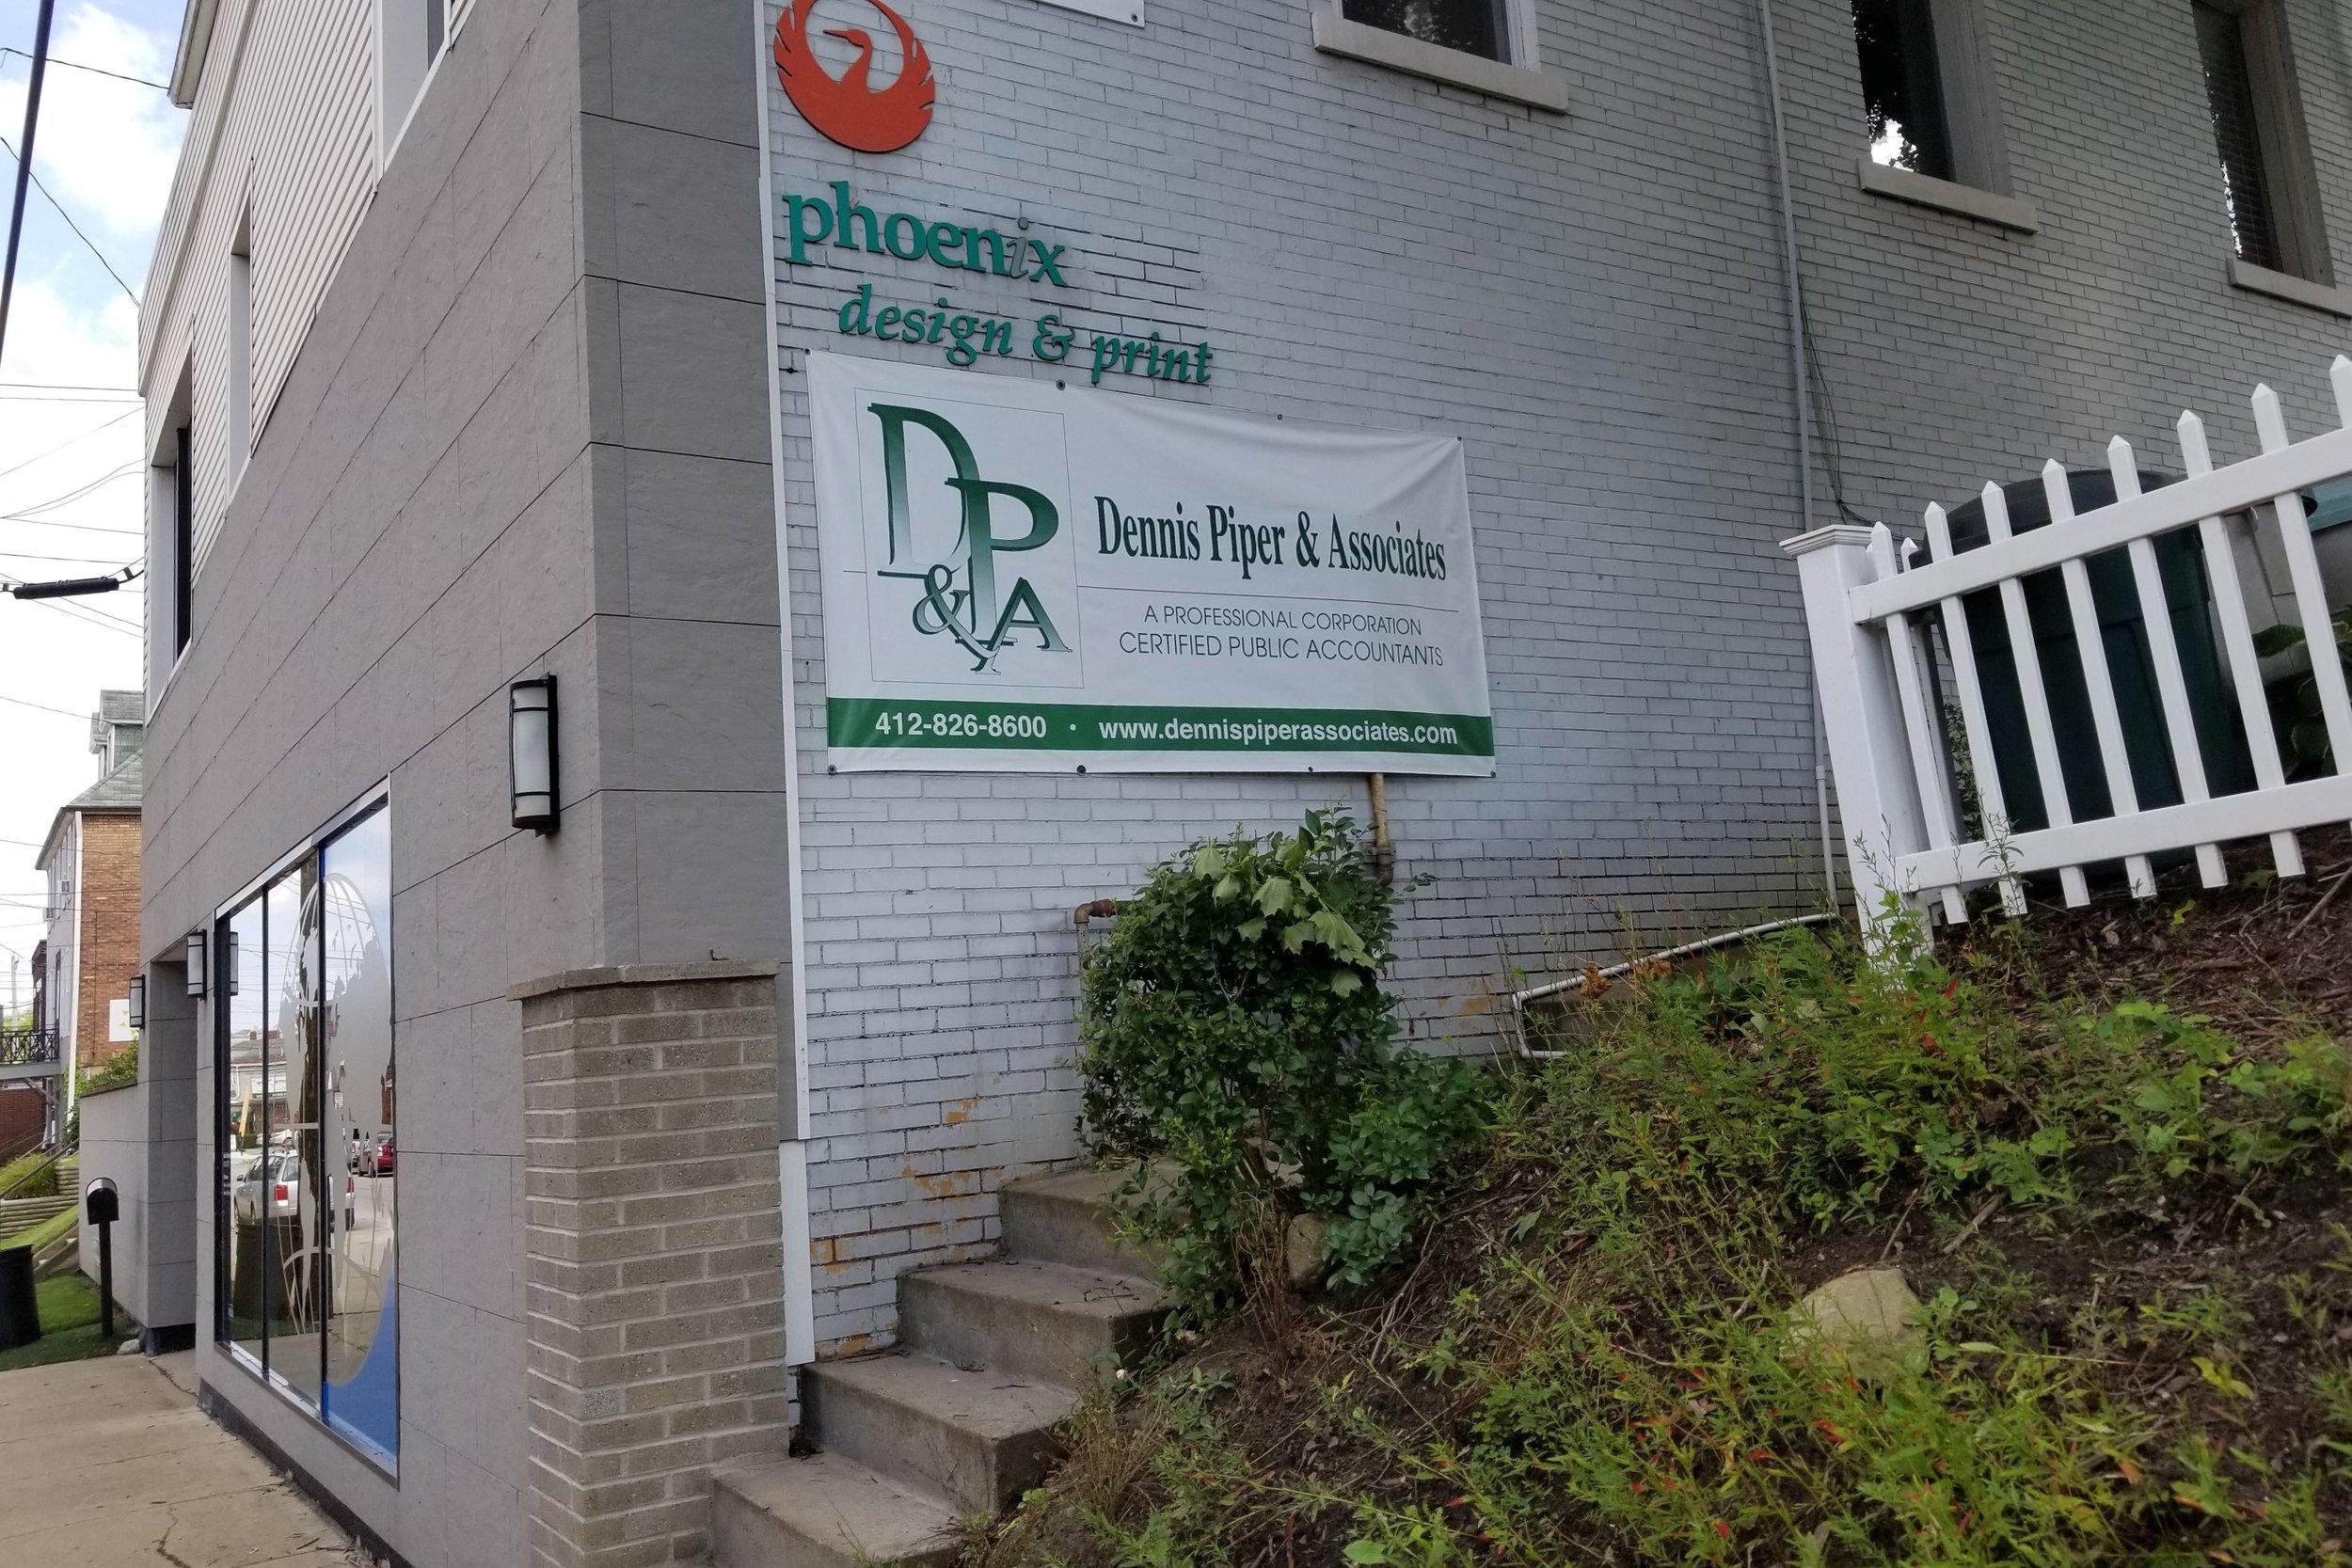 Dennis Piper & Associates - 614 5th Ave, (412) 389-9154